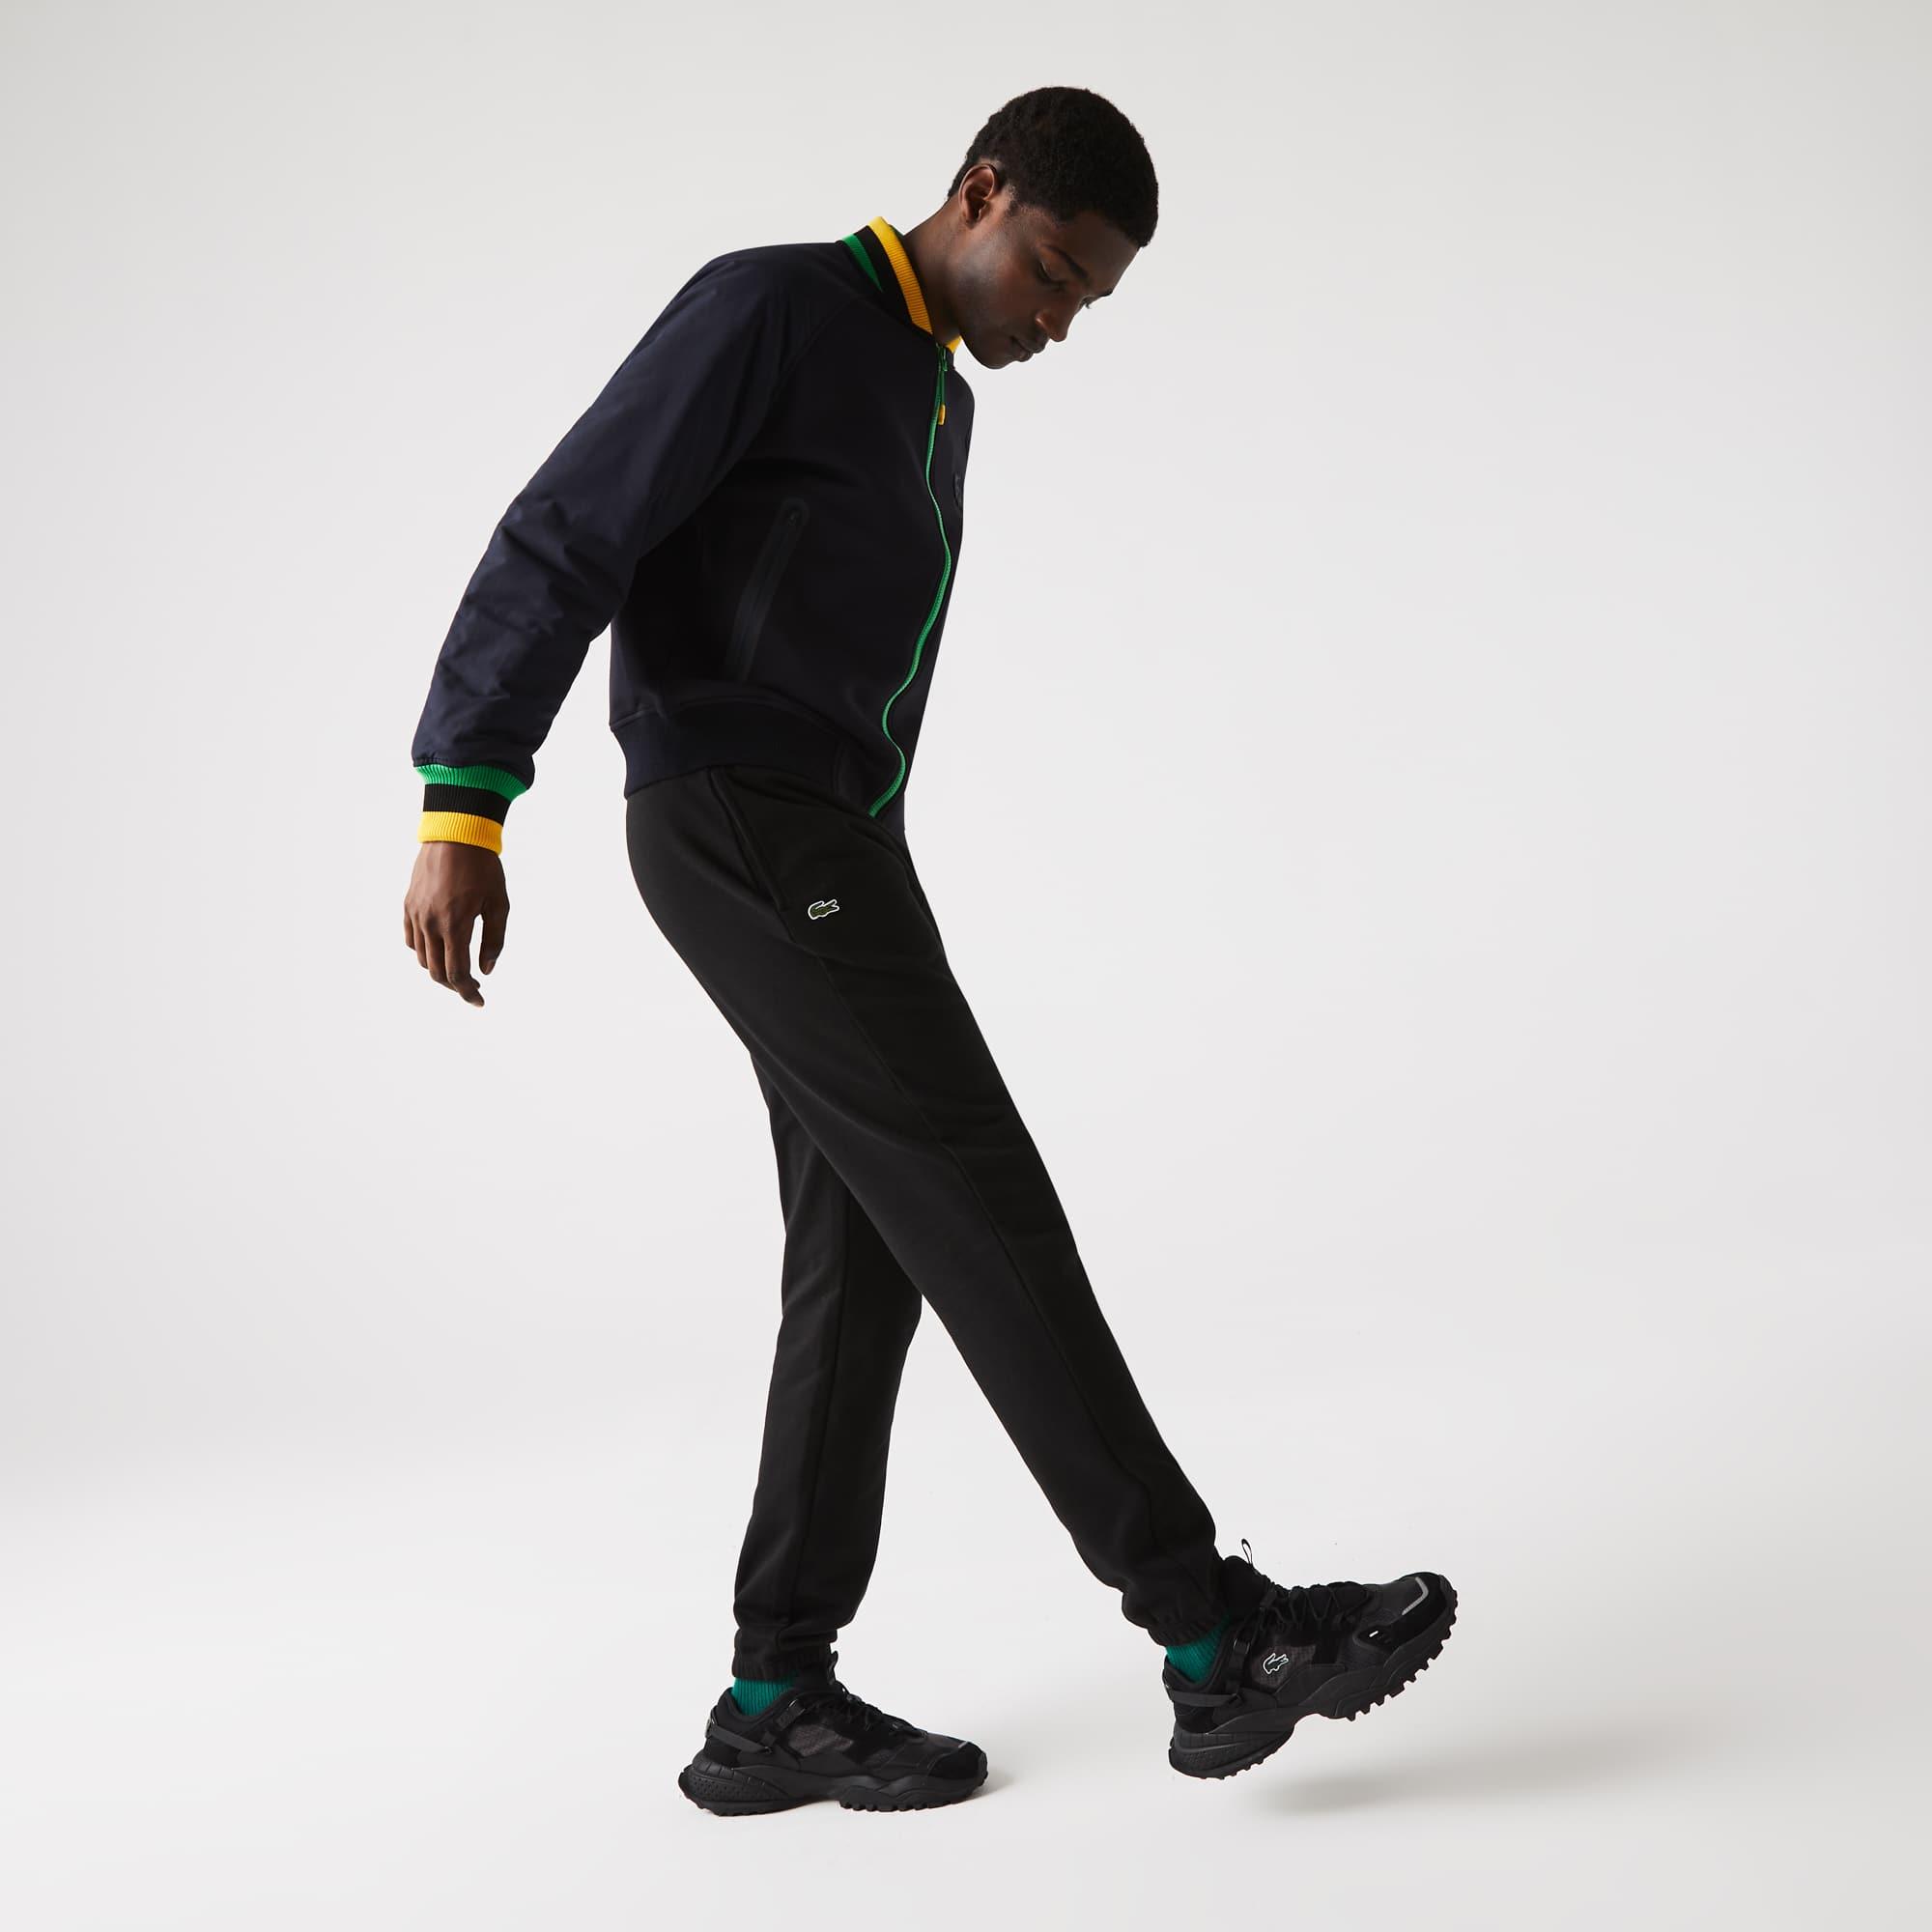 Jogginghose aus einfarbigem Vliesstoff LACOSTESPORT